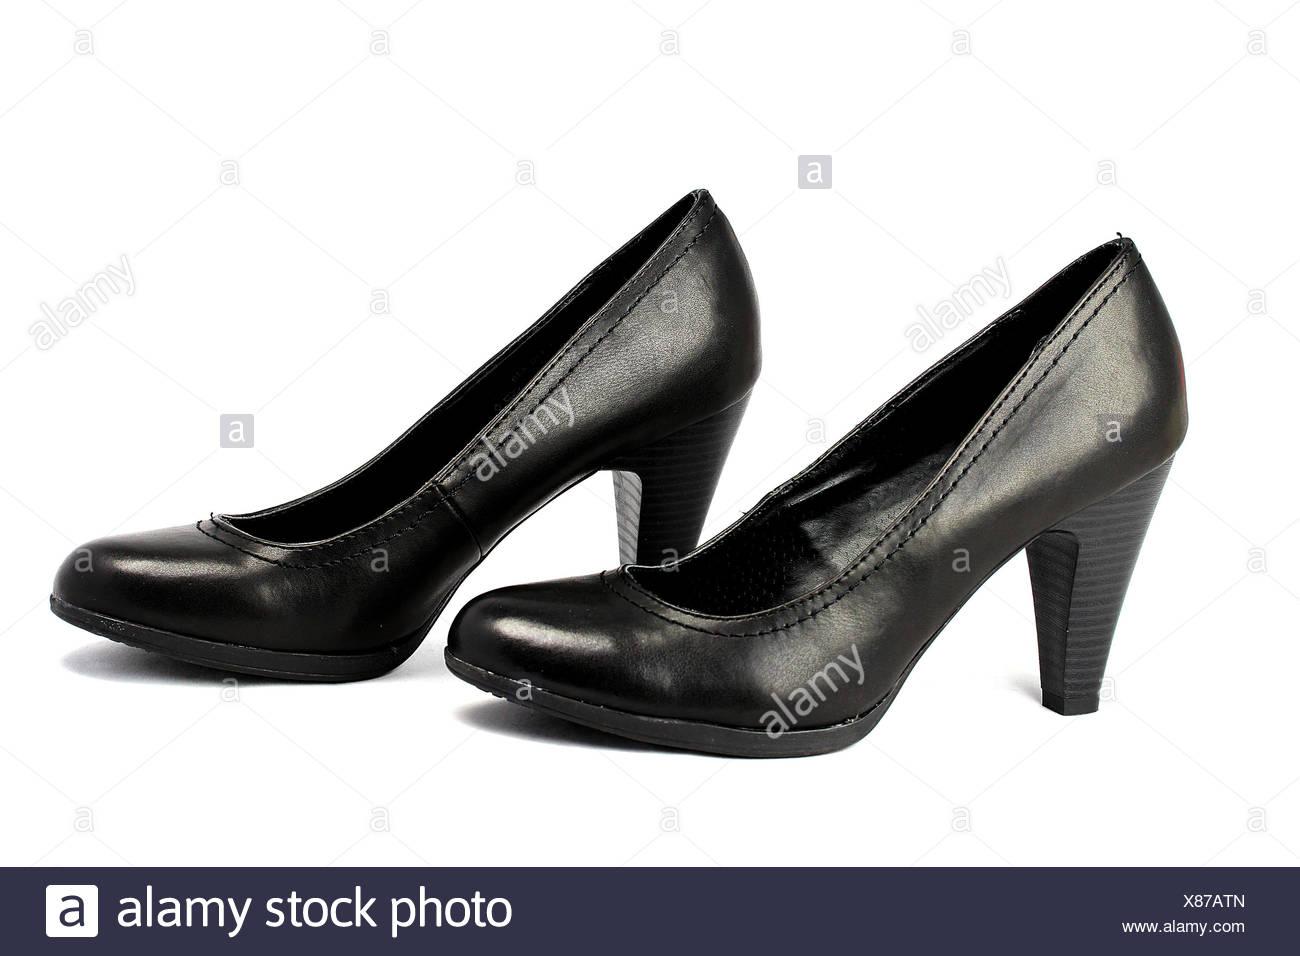 high heels - Stock Image